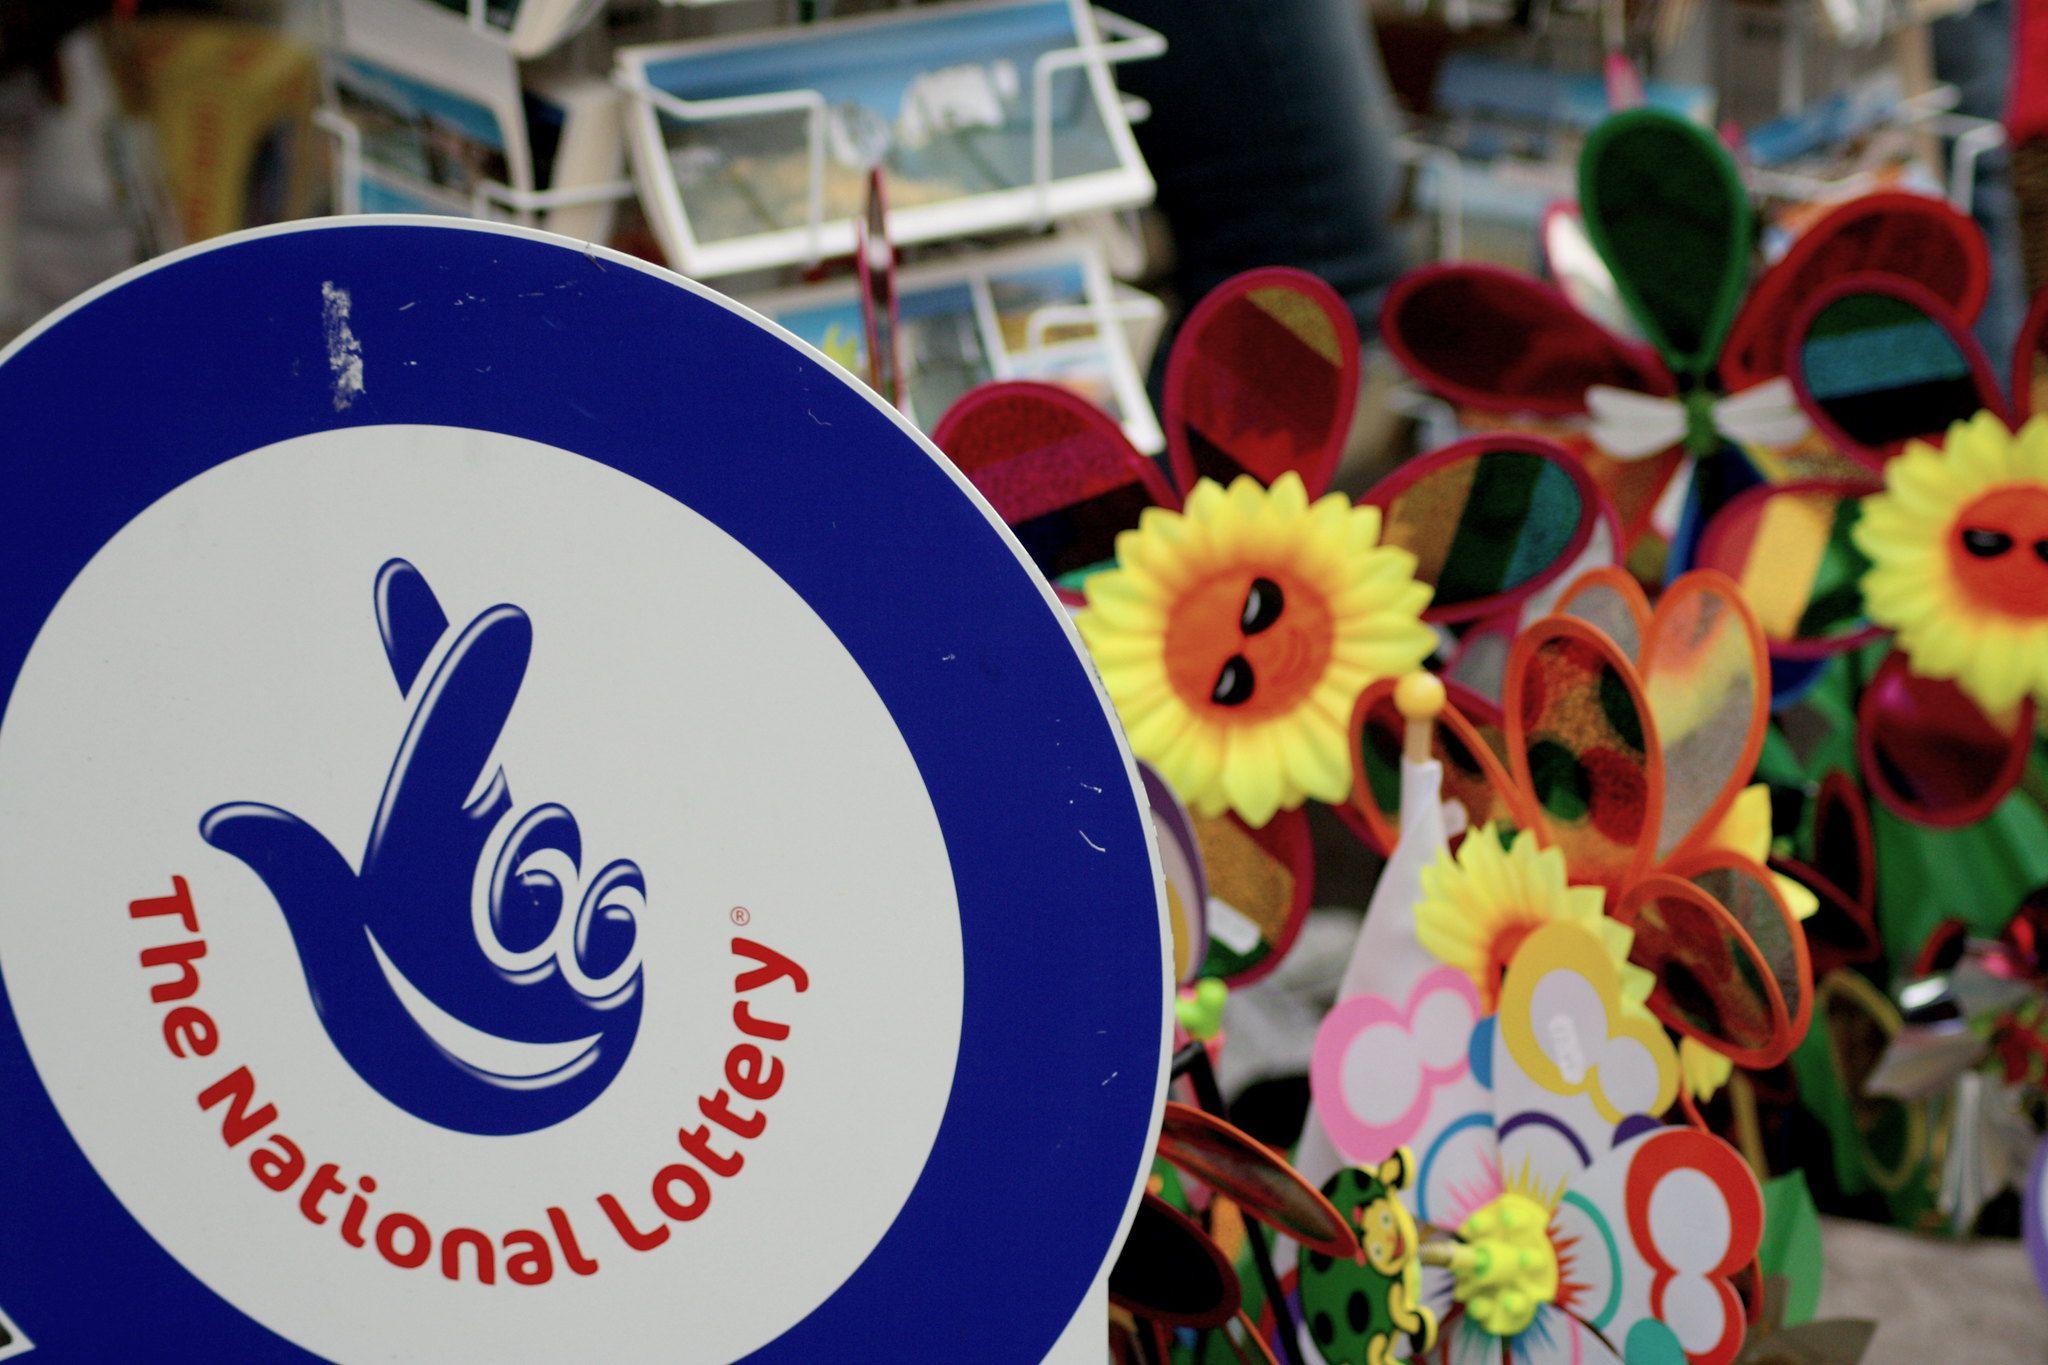 The National Lottery, Schild der National Lottery, britische Lotterie